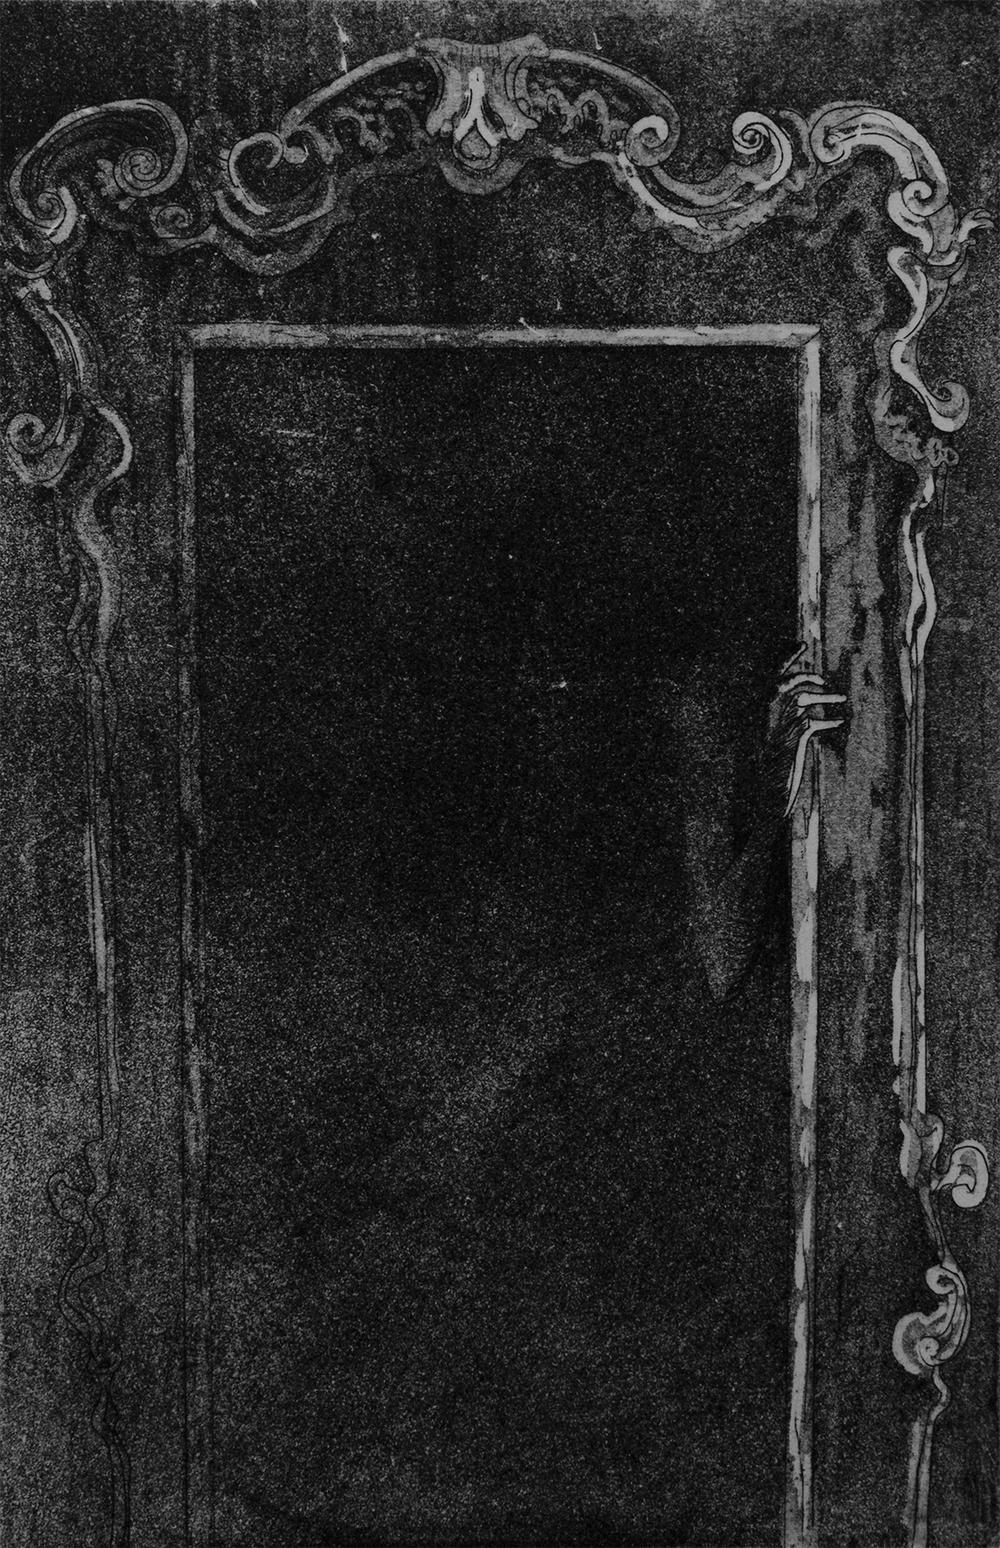 Waiting II,  2015, etching and aqua tint on paper, 6x9''